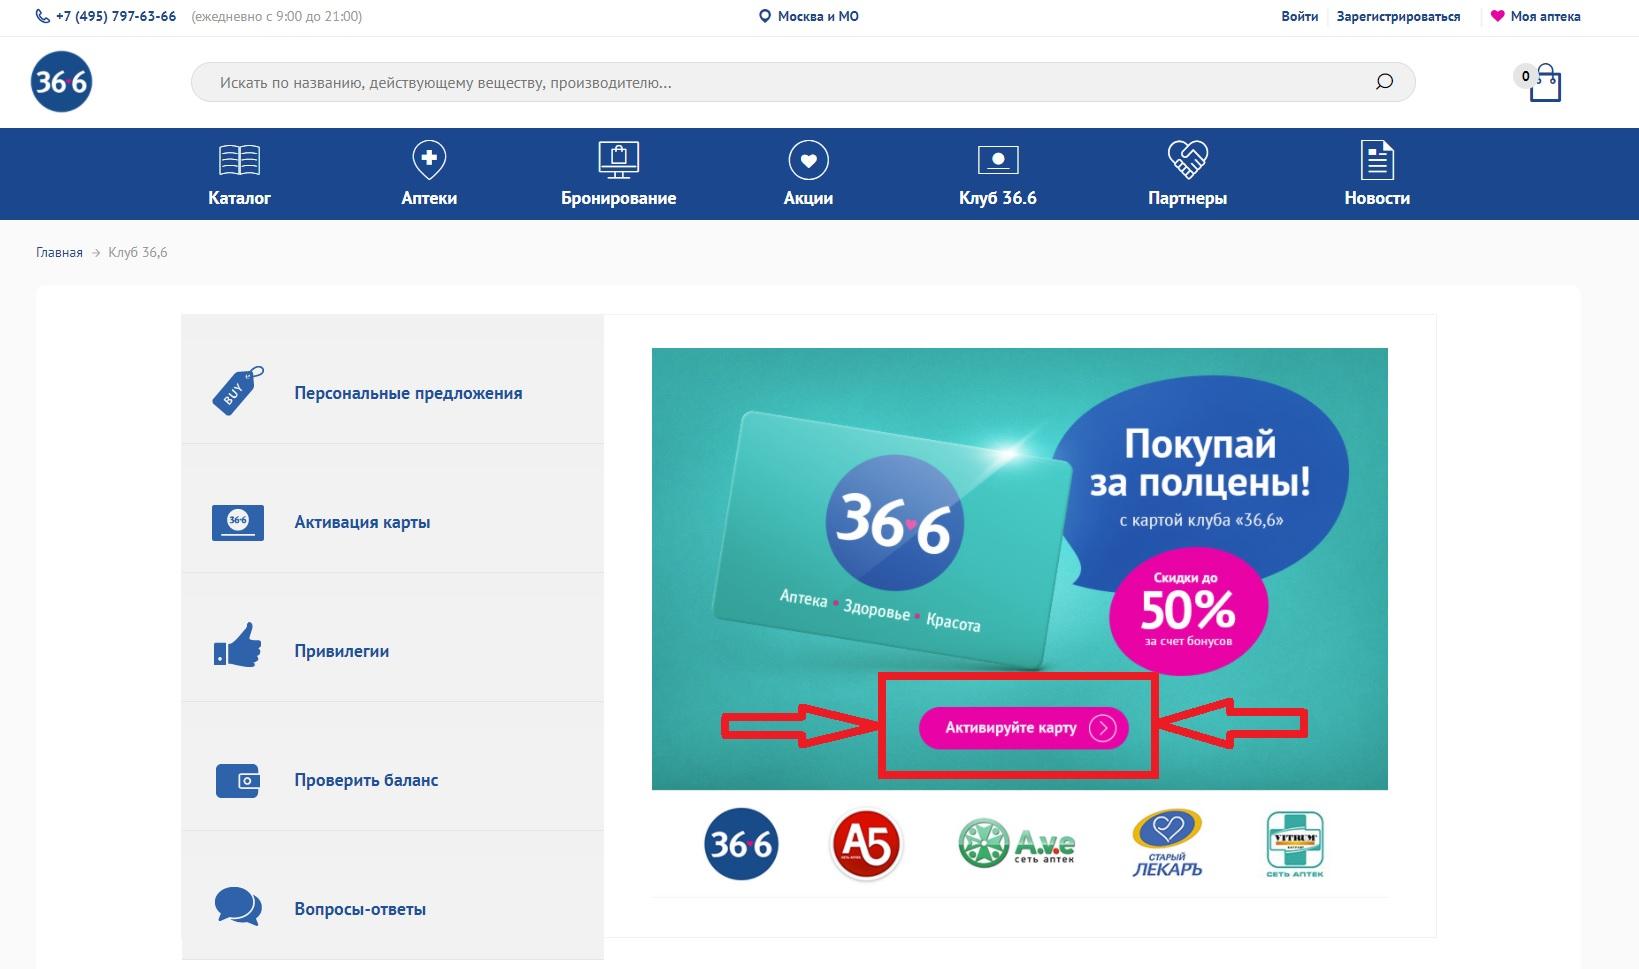 apteka366.ru - активация карты аптеки 36,6